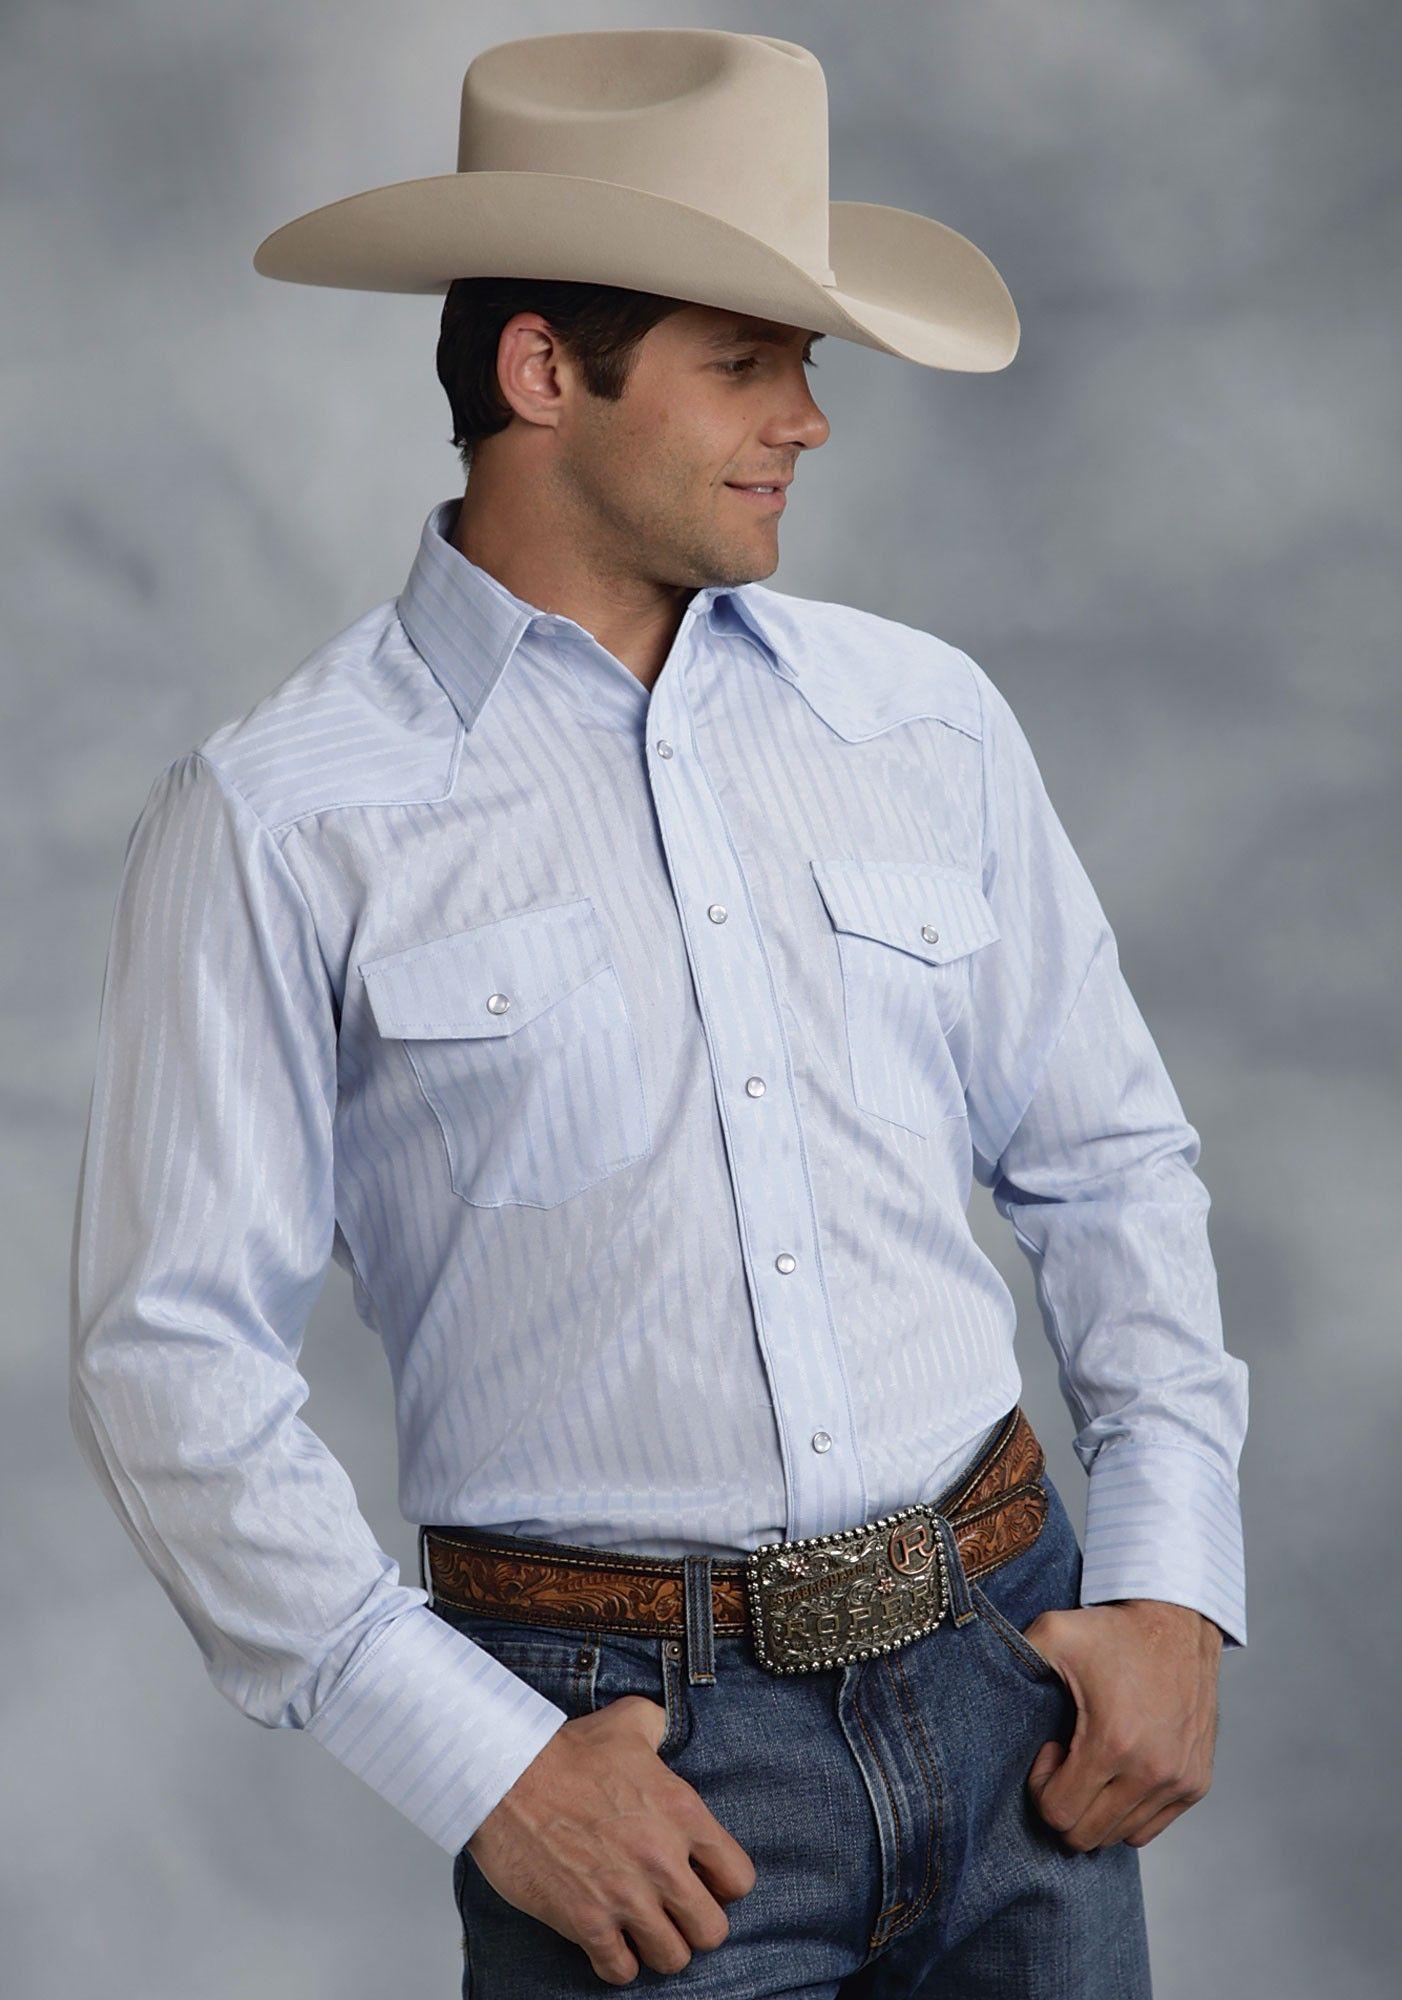 1970's Retro Western Shirt: 70s -Kennington- Mens white, navy, light blue,  orange and silver polyester cotton longsleeve western shirt with folding  collar ...